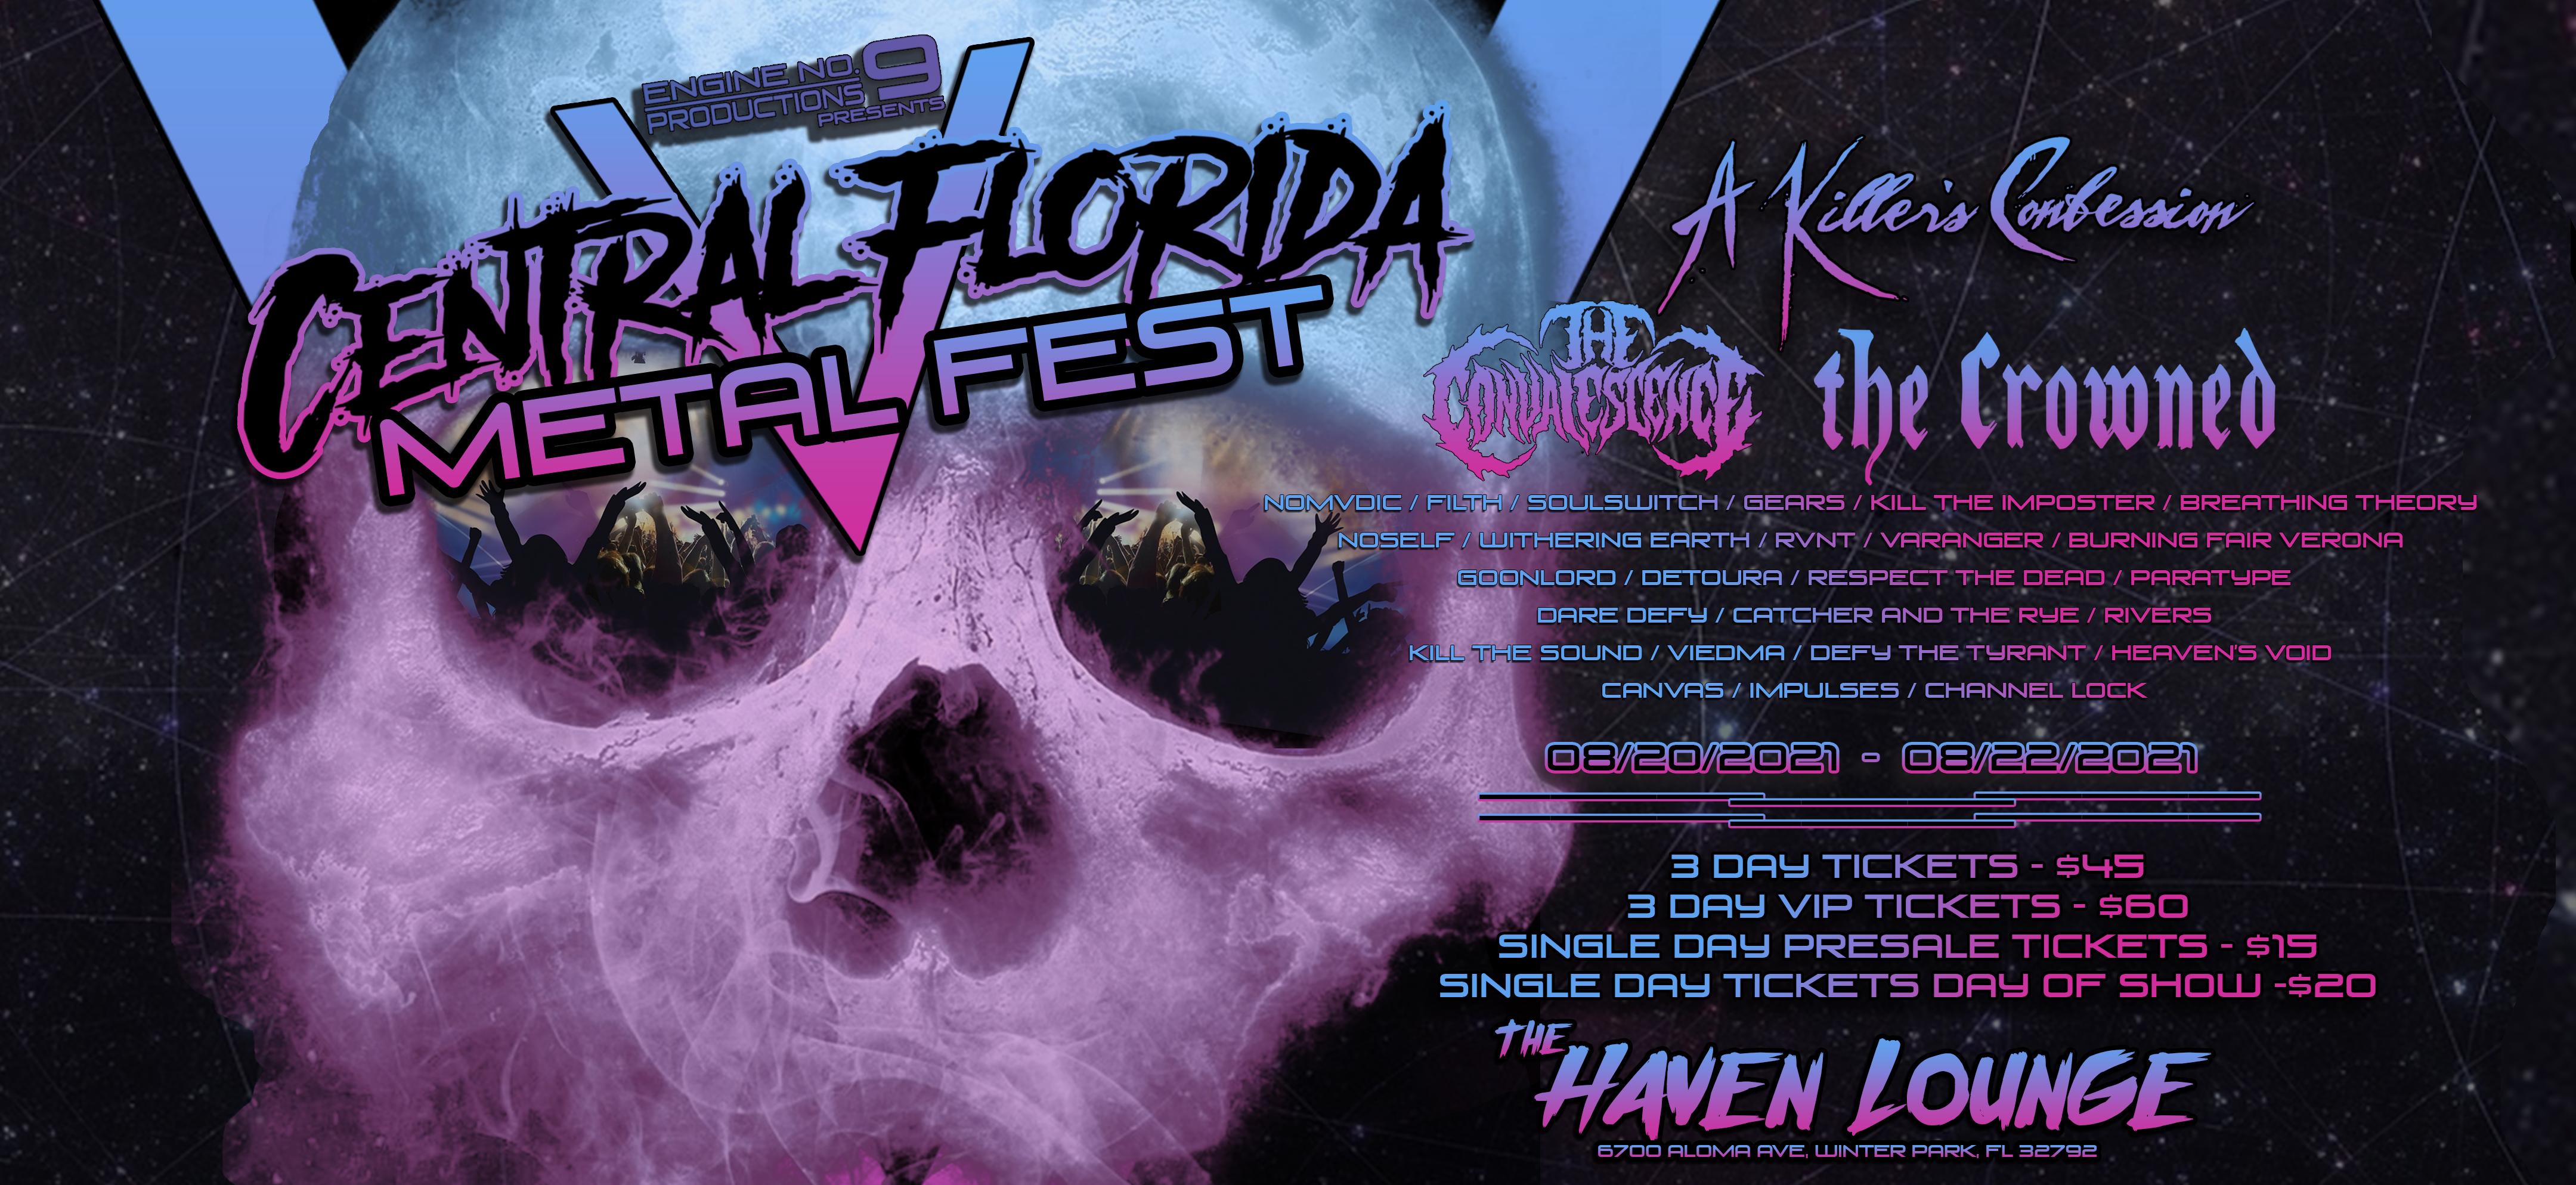 CENTRAL FLORIDA METAL FEST V Tickets, Fri, Aug 20, 2021 at 5:00 PM   Eventbrite